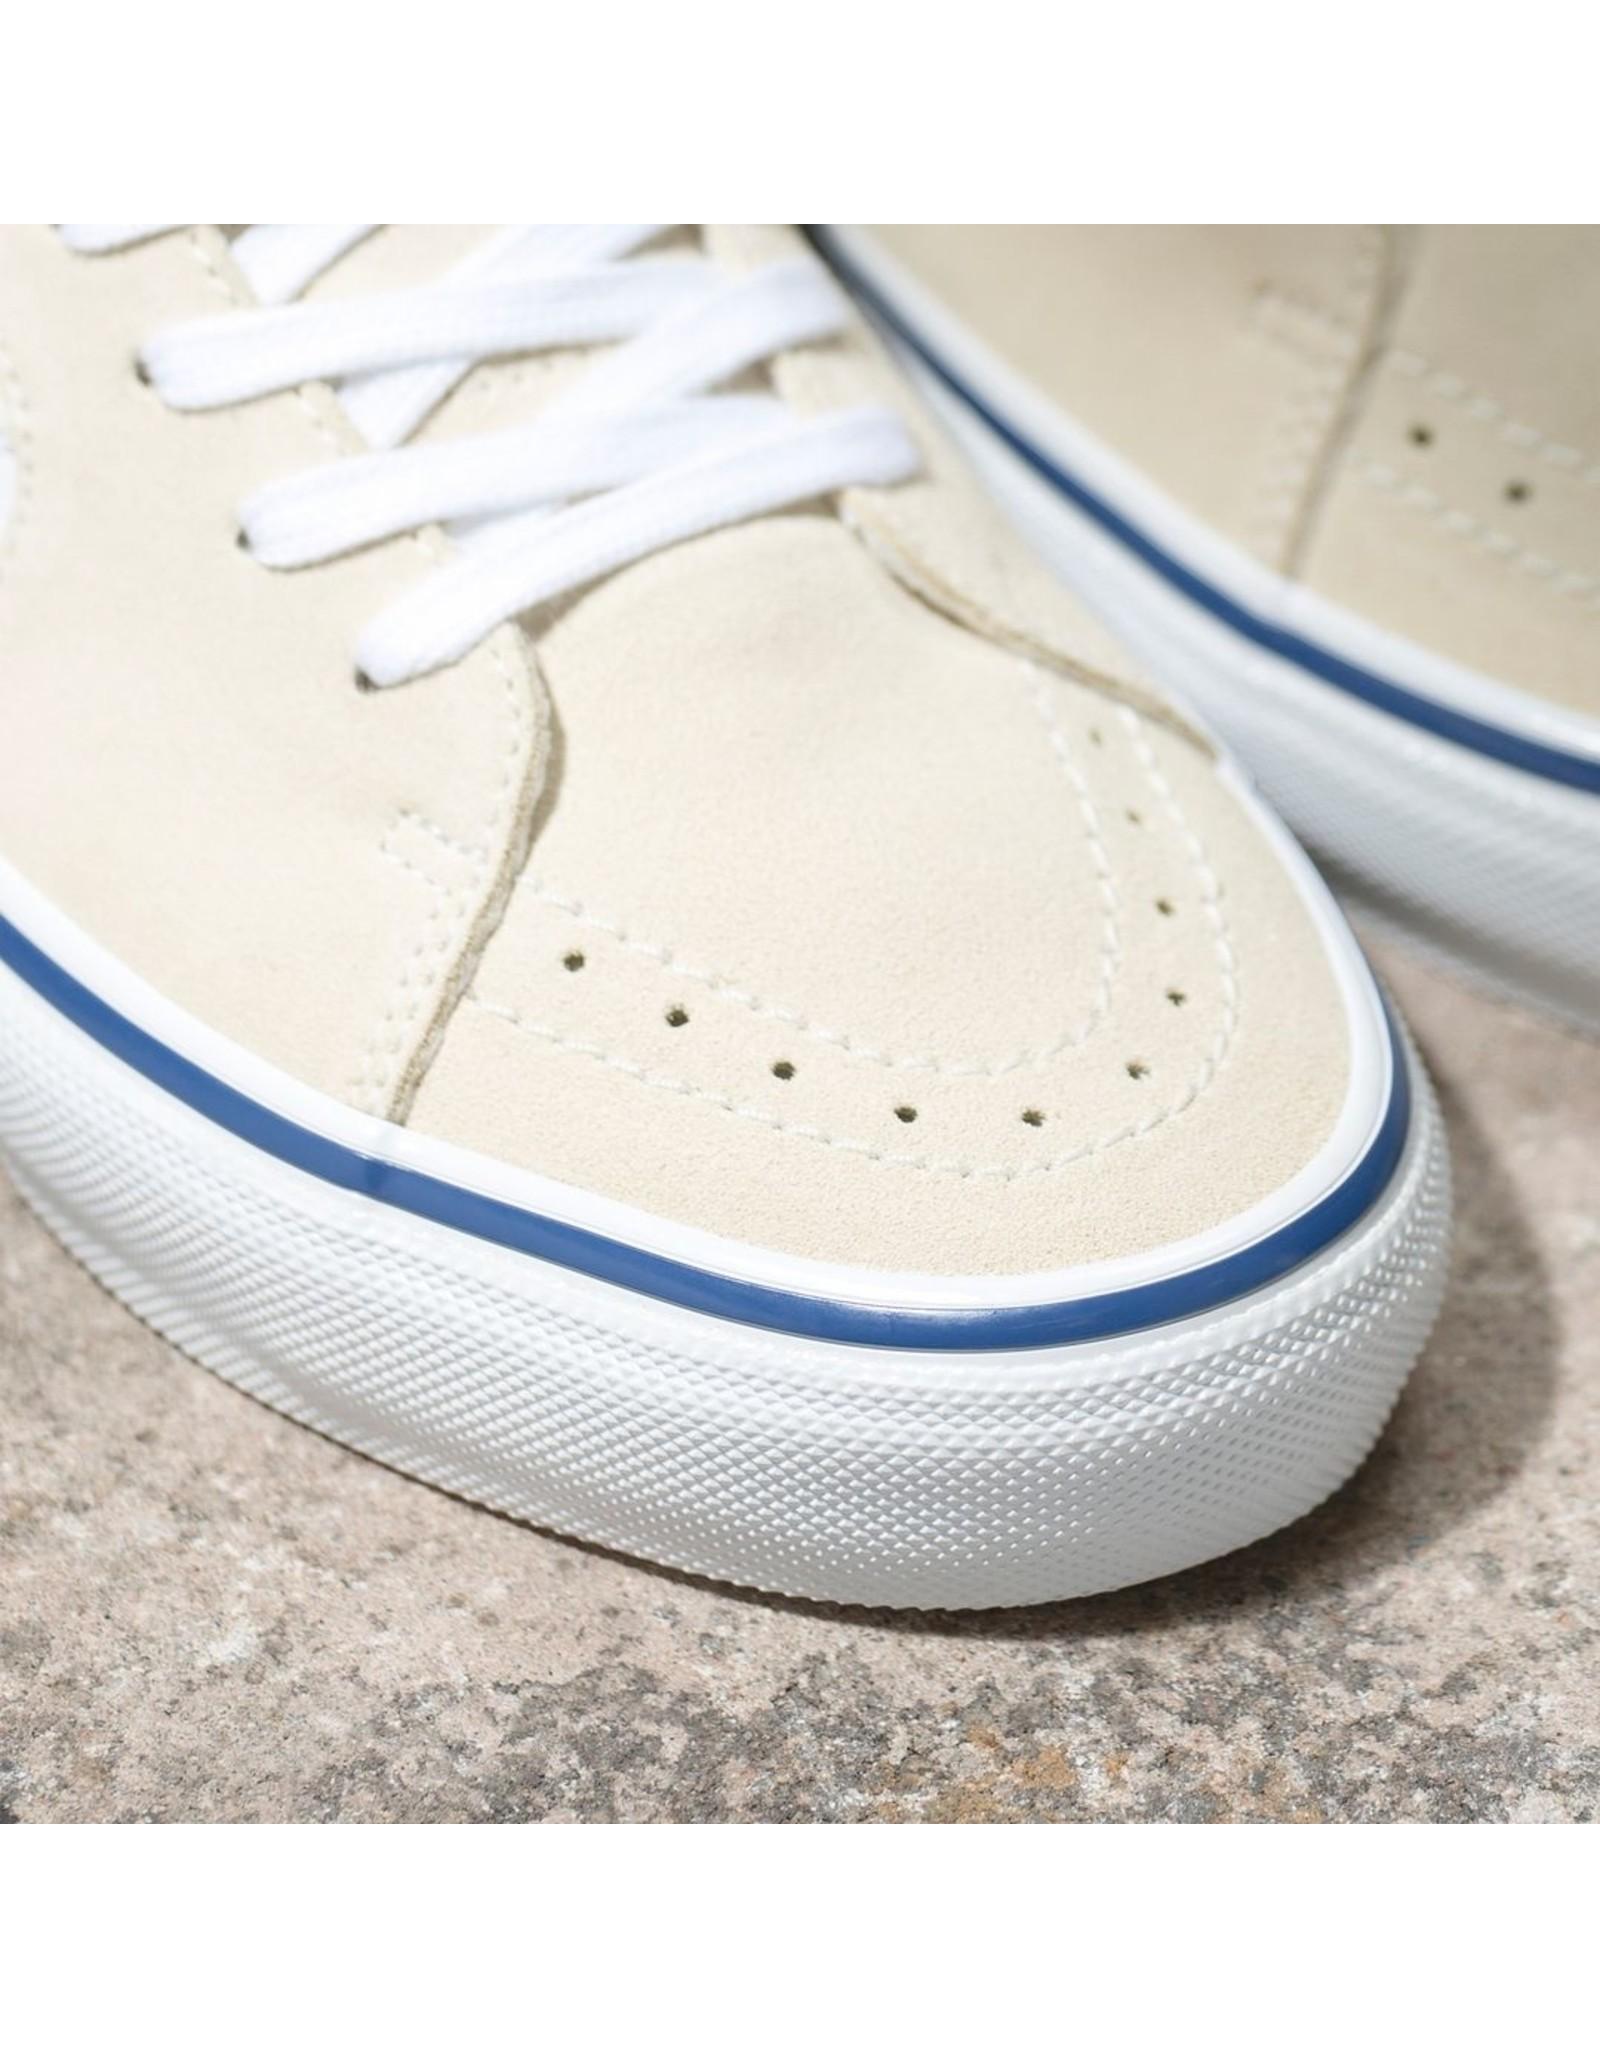 VANS VANS - SK8-Hi SKATE - OFF WHITE